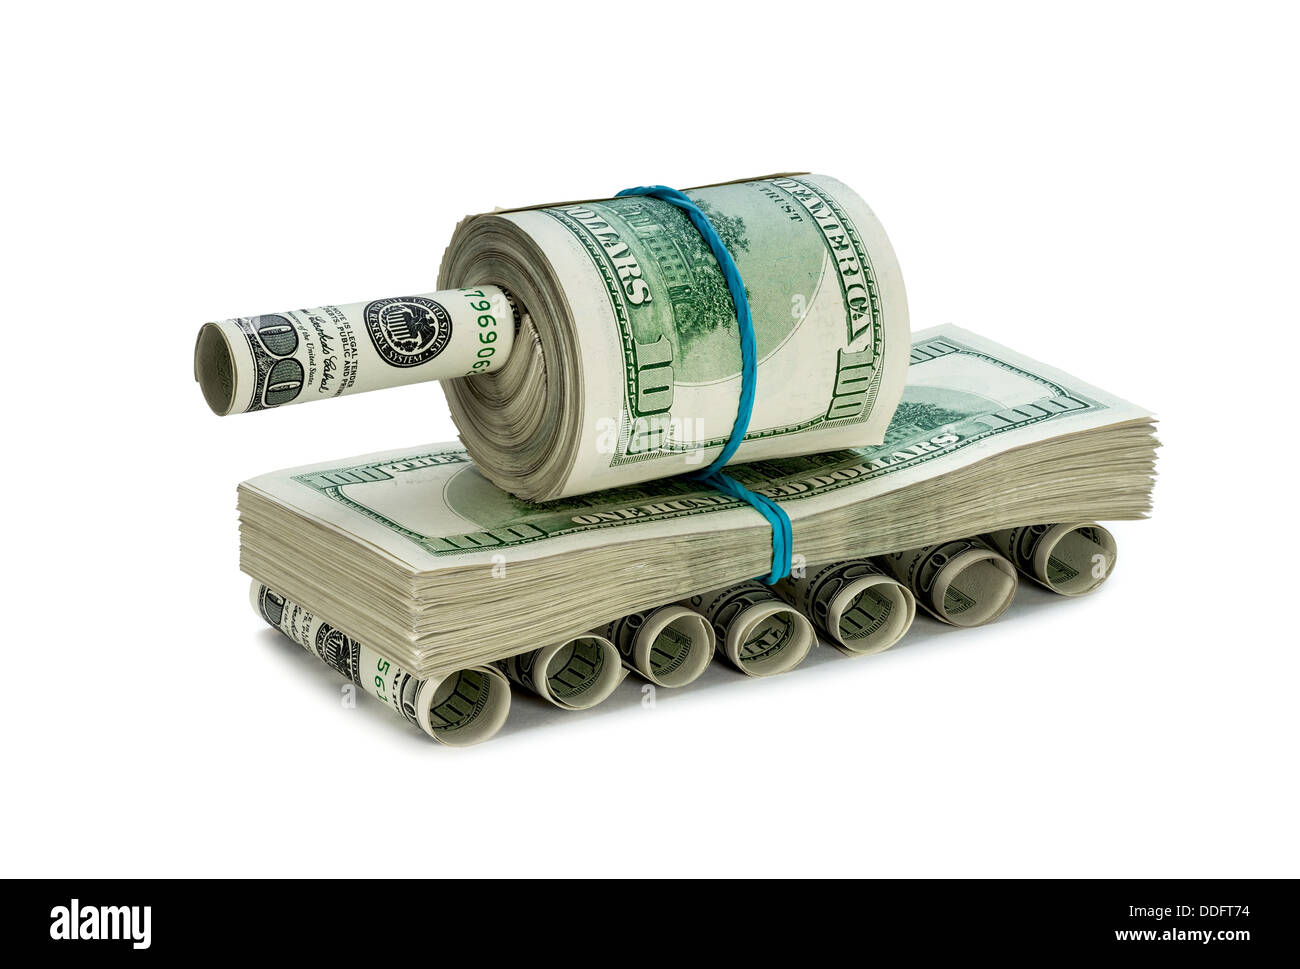 Tank made of money - Stock Image